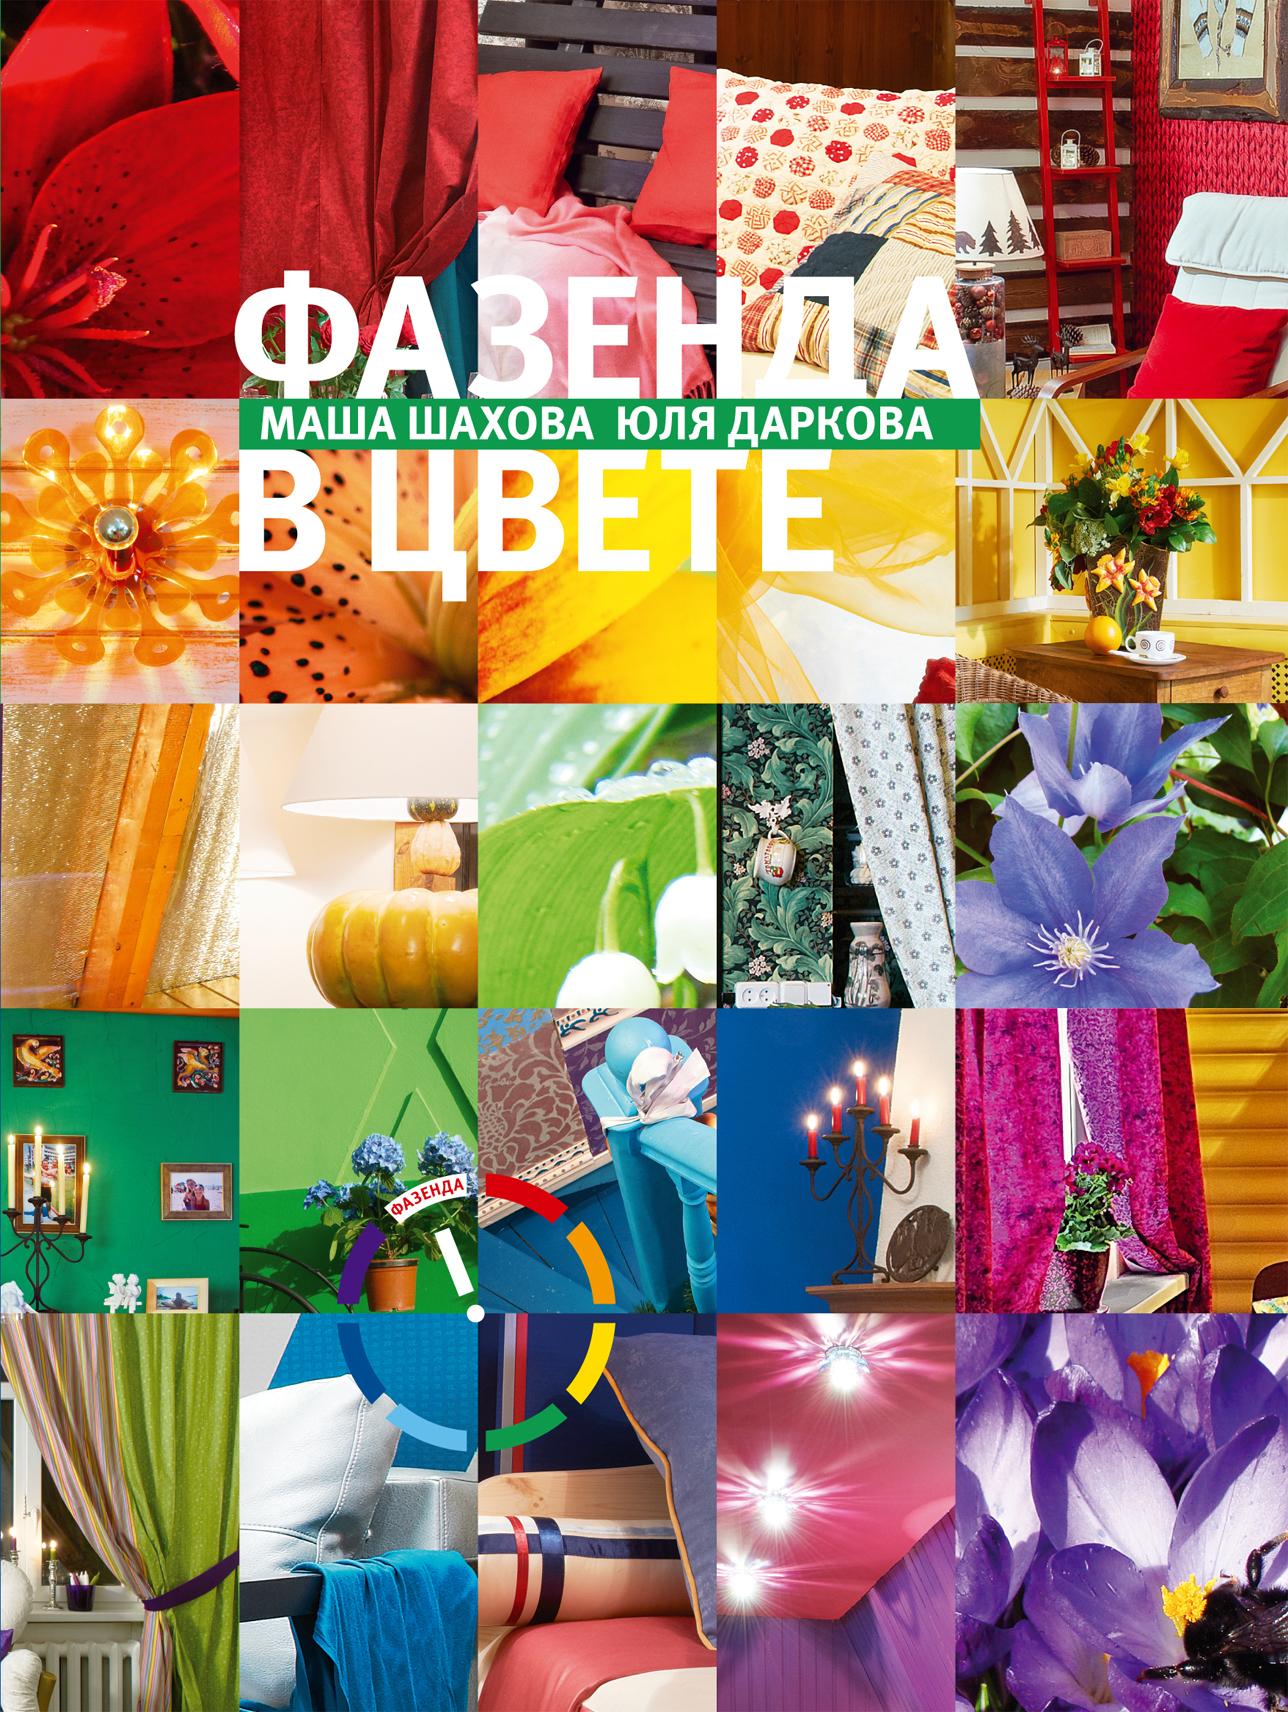 Фазенда 3. Фазенда в цвете (Фазенда. Первый канал представляет) от book24.ru